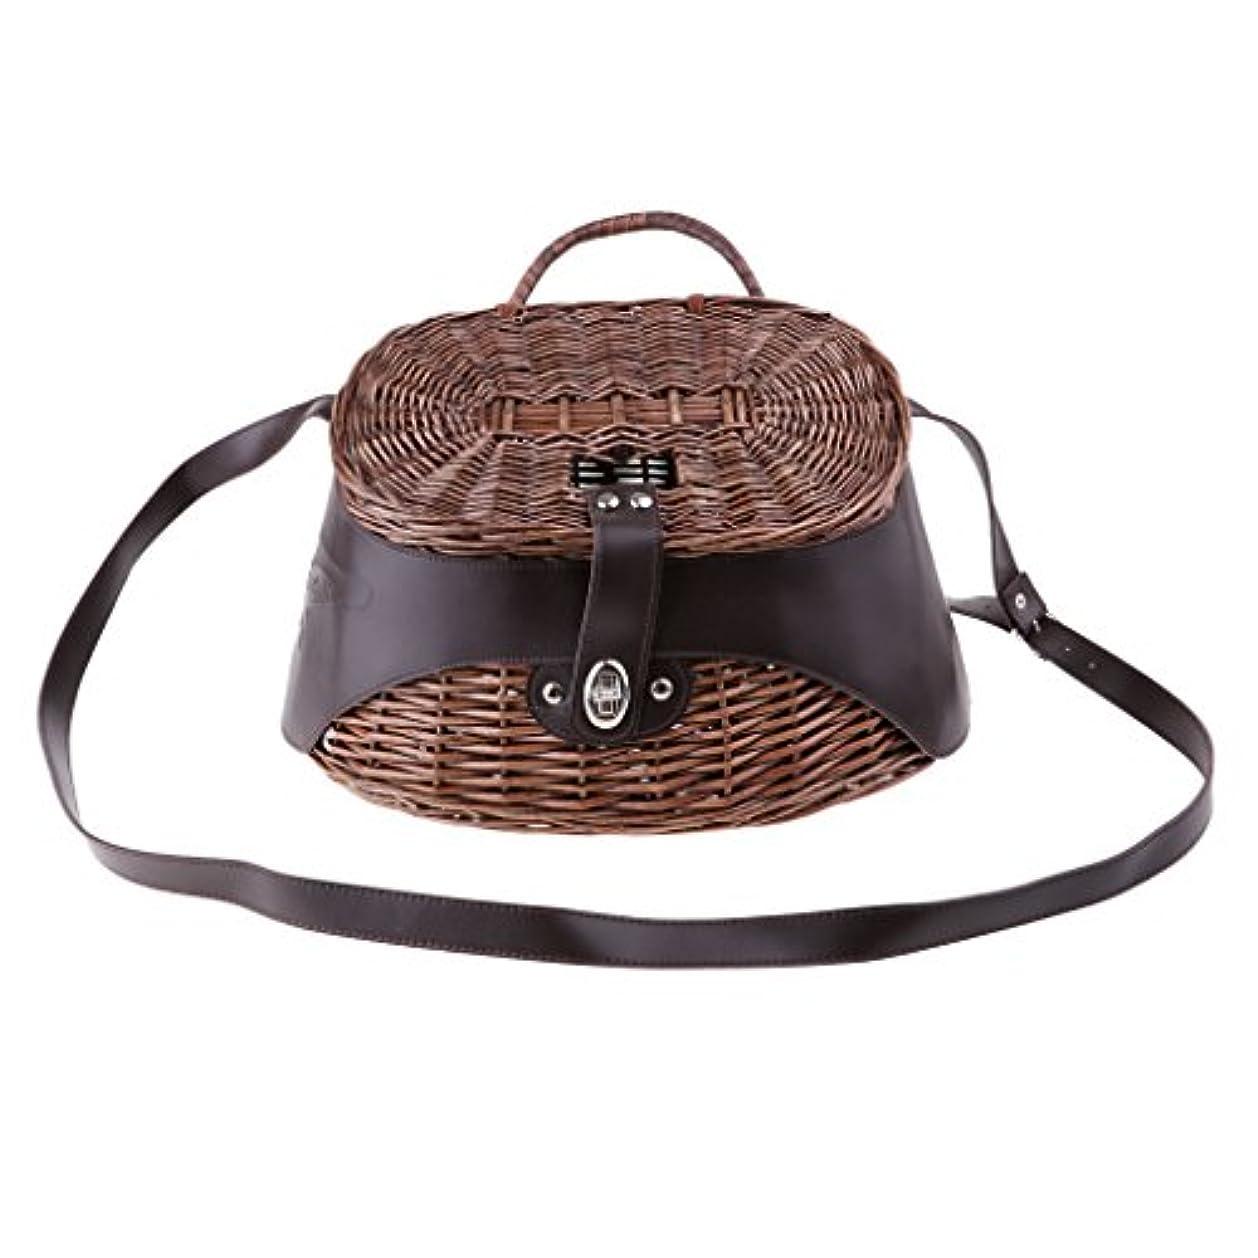 SunniMix 釣りバスケット 魚ケージ ルアーケース 肩掛け 籐織り 温度と湿度制御 新鮮保つ 換気提供 通気性